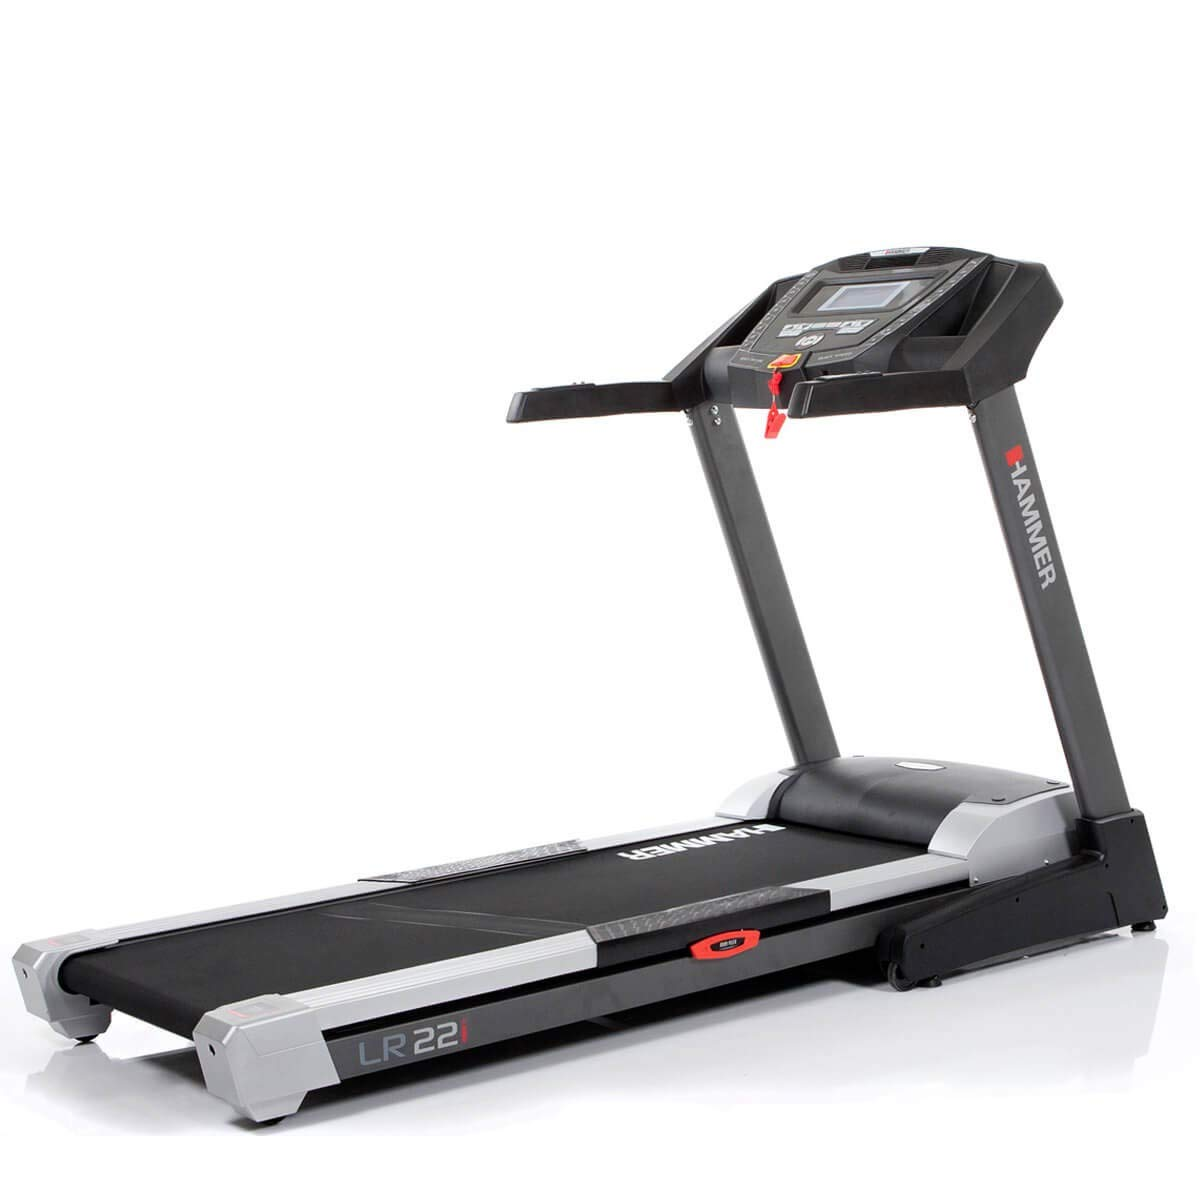 Hammer - Cinta de correr plegable Life Runner LR 22i hasta 22 km/h ...